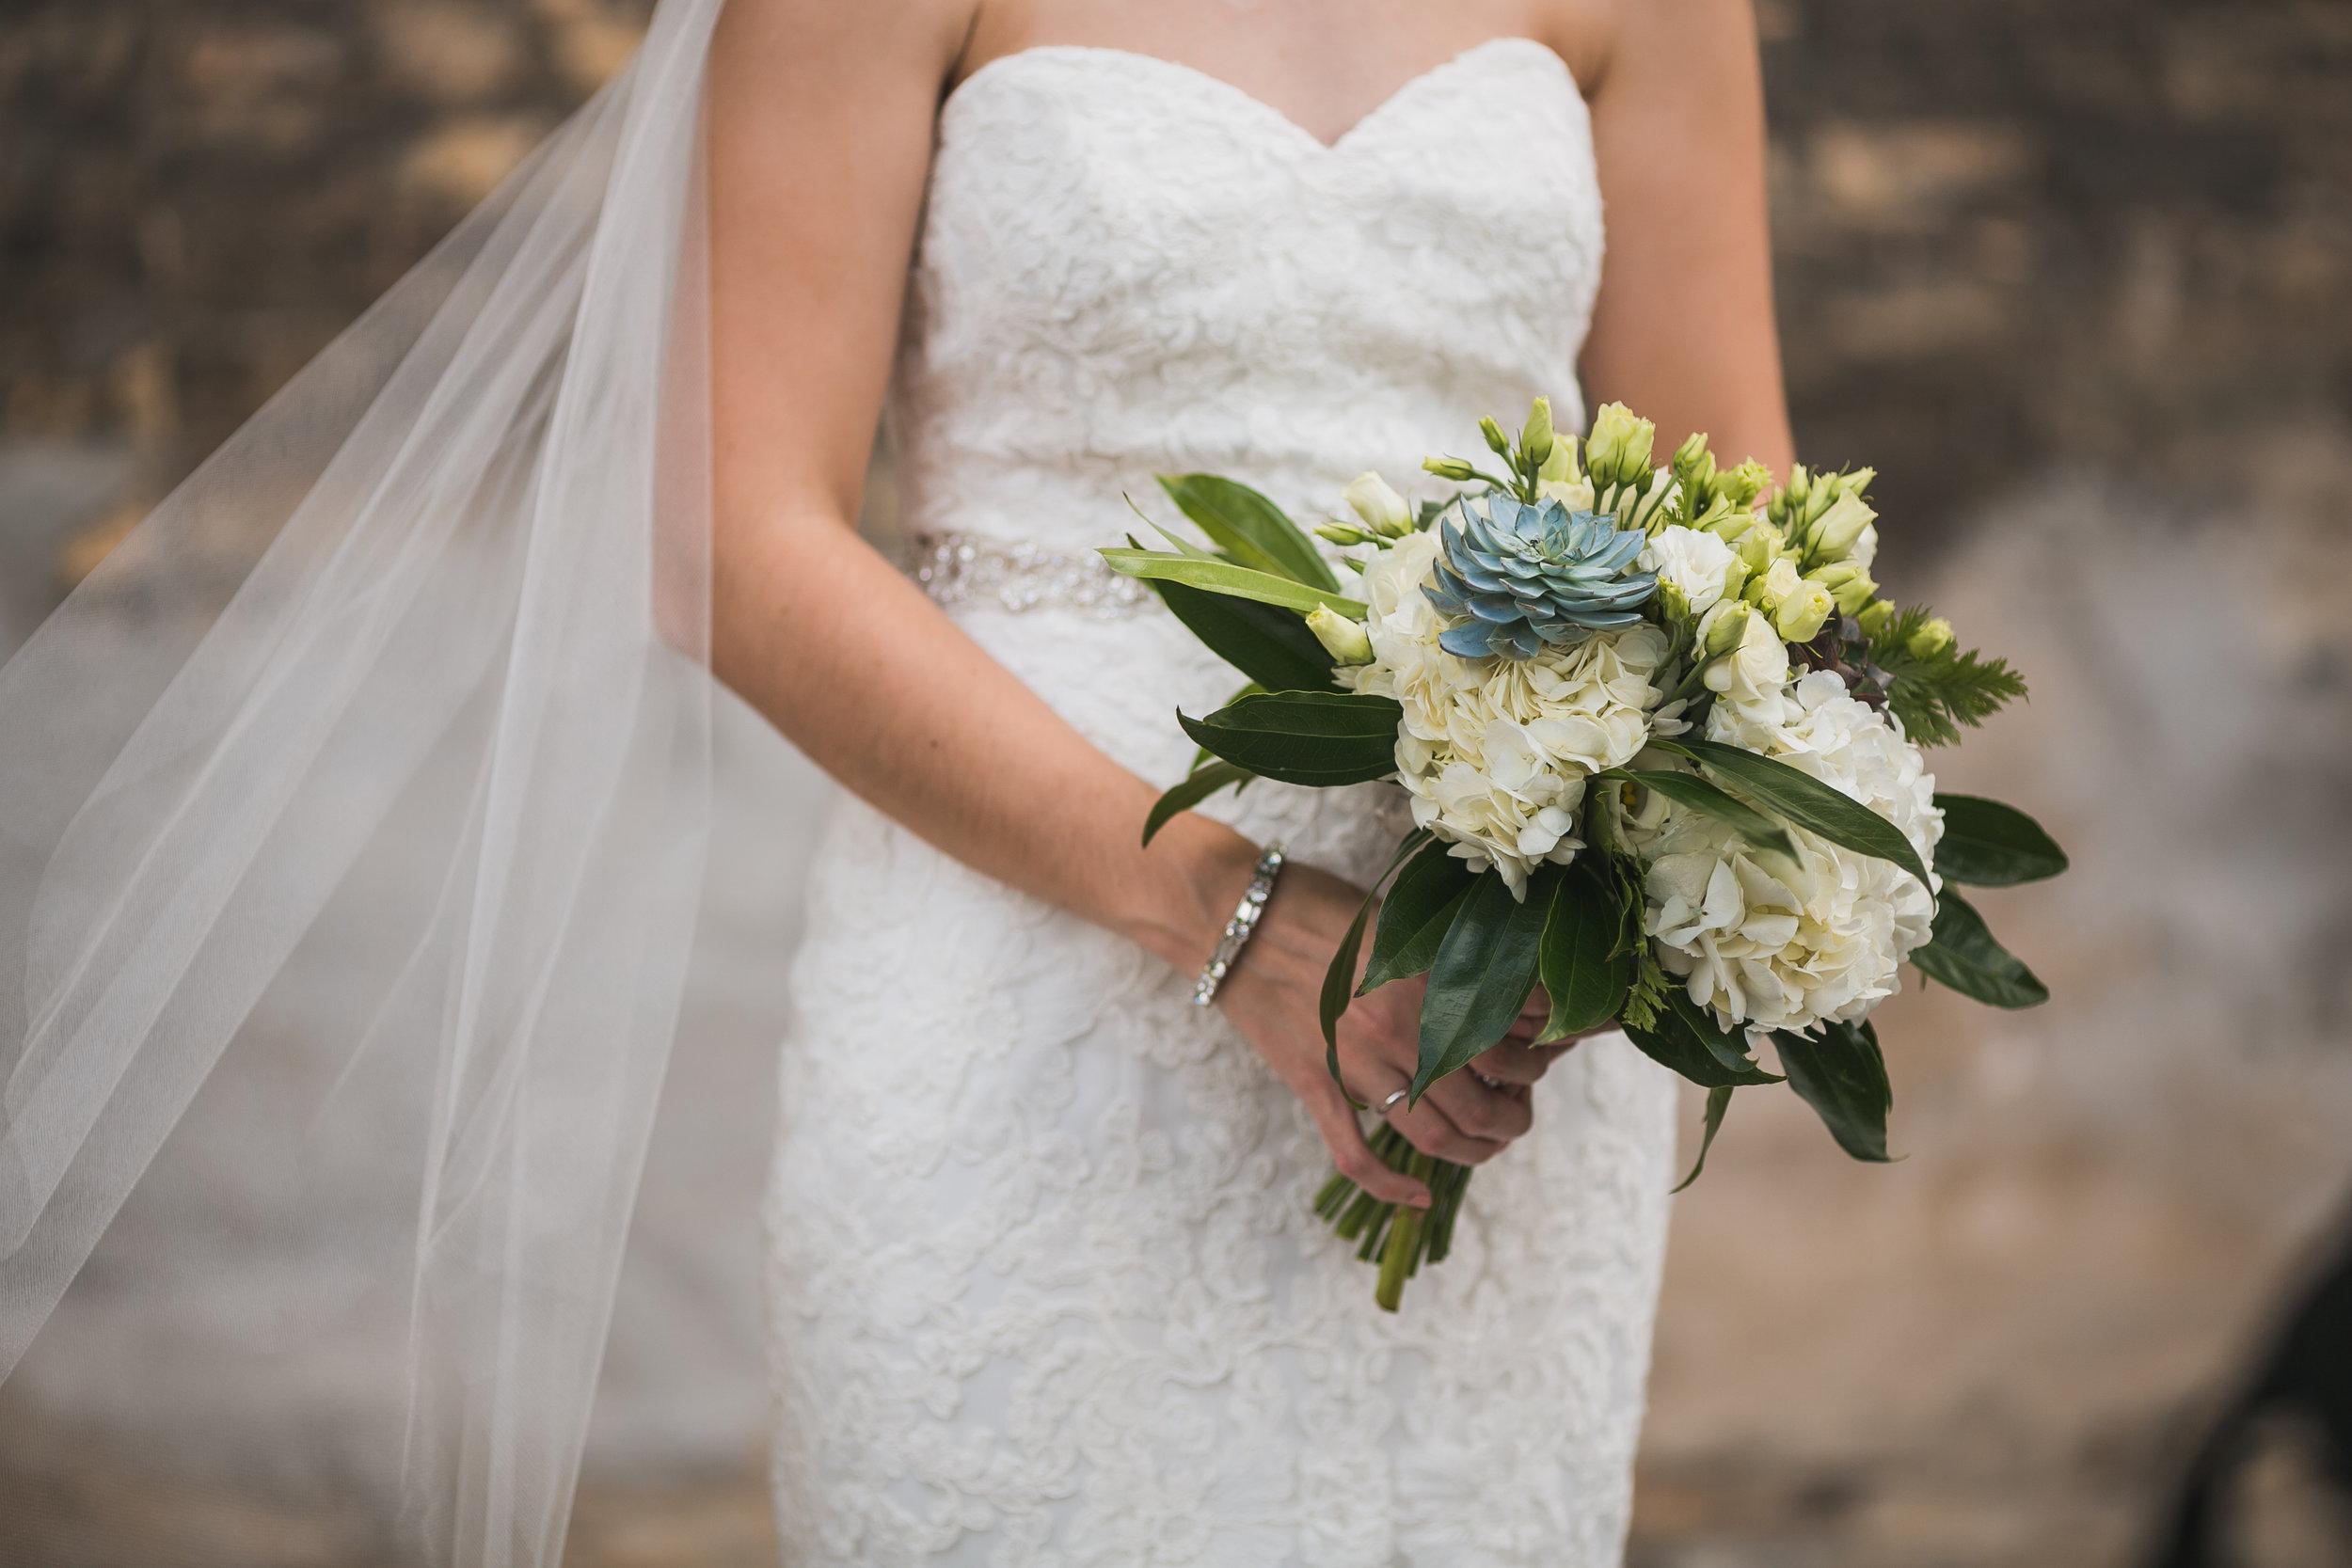 wisconsin-wedding-acowsay-uttke-photography-35.jpg